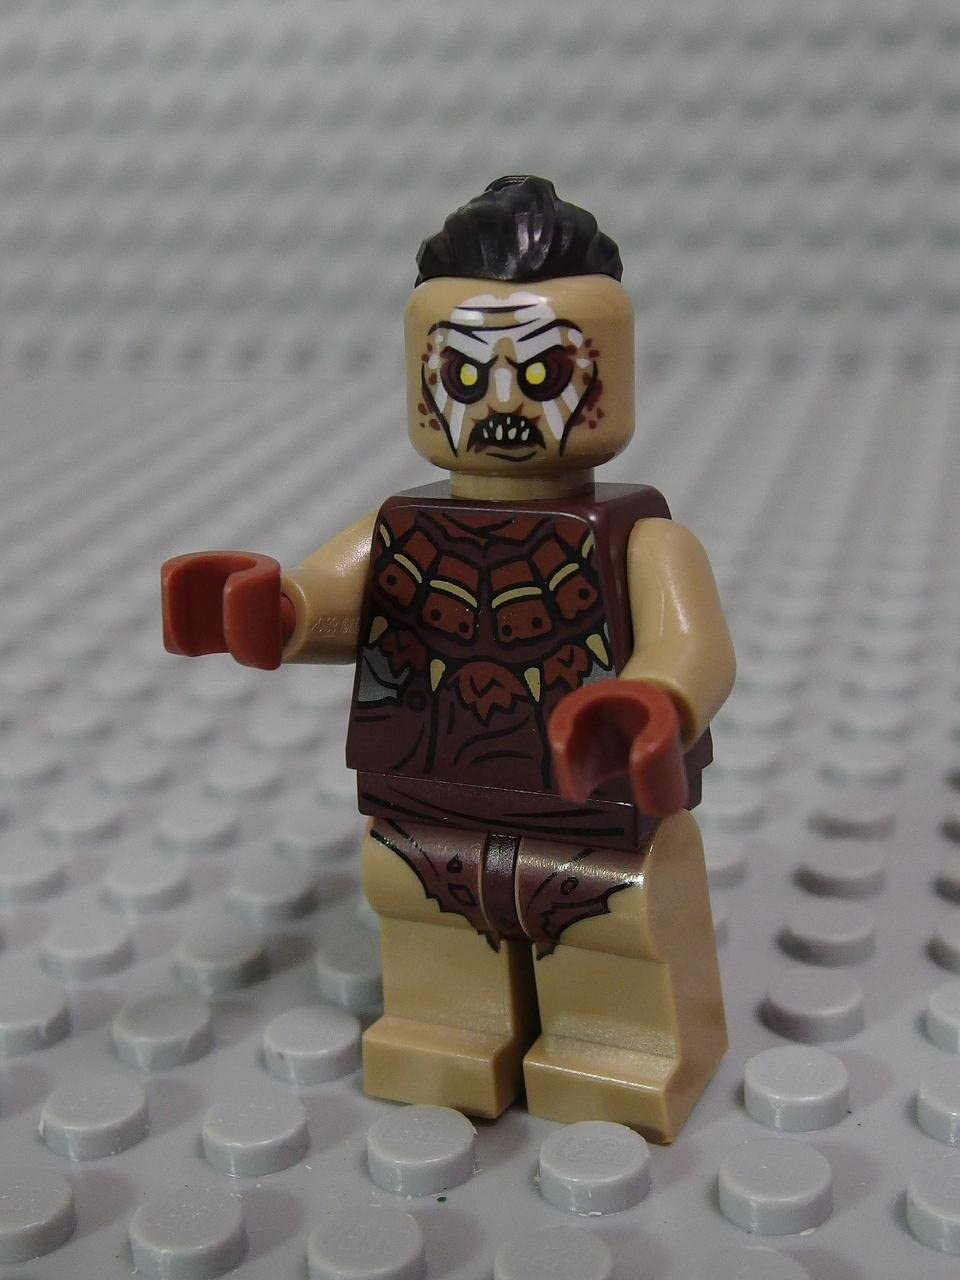 LEGO Minifig The Hobbit_101 Hunter Orc_C